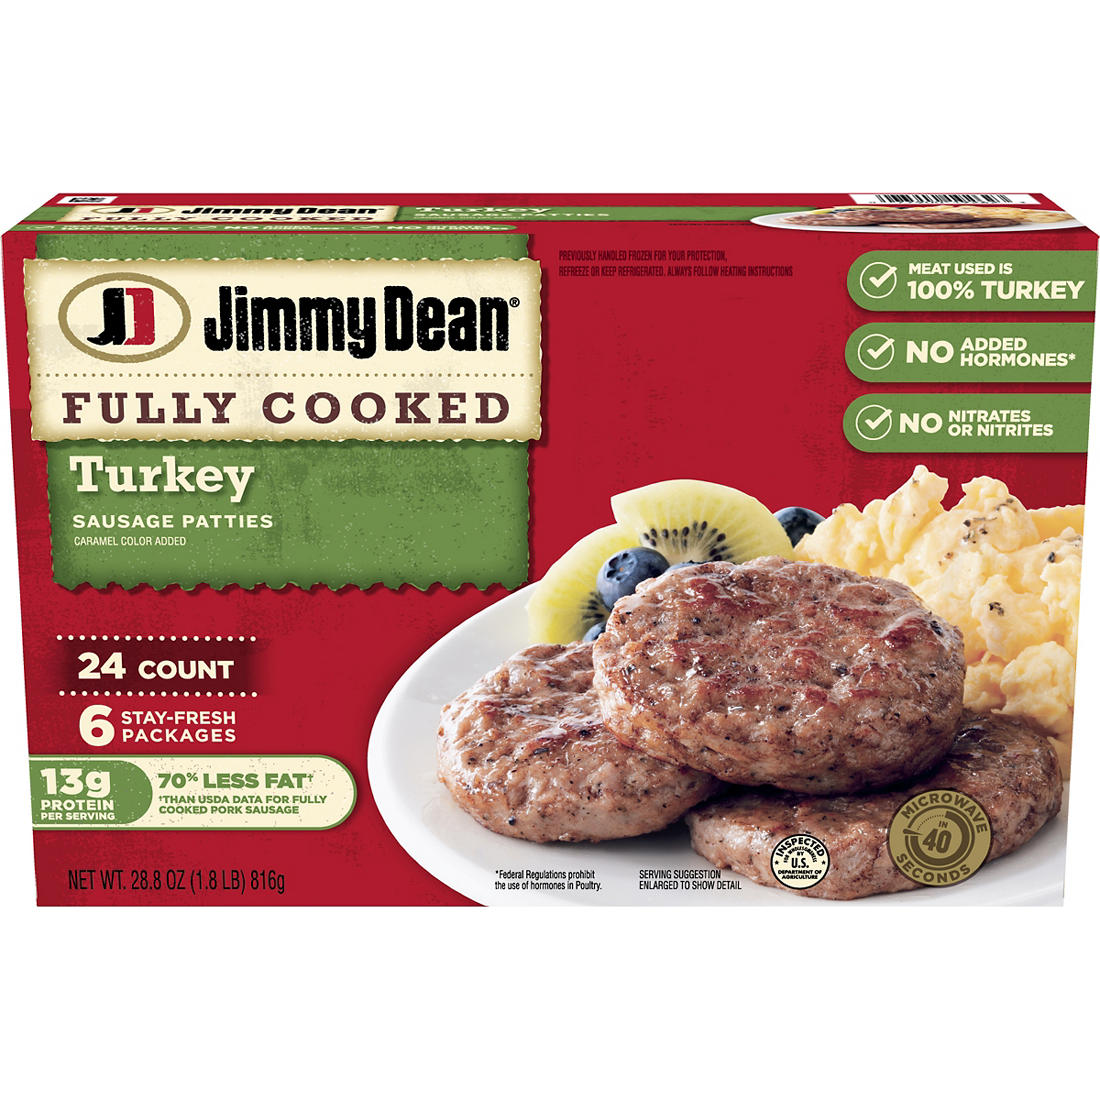 Jimmy Dean Turkey Sausage Patties, 24